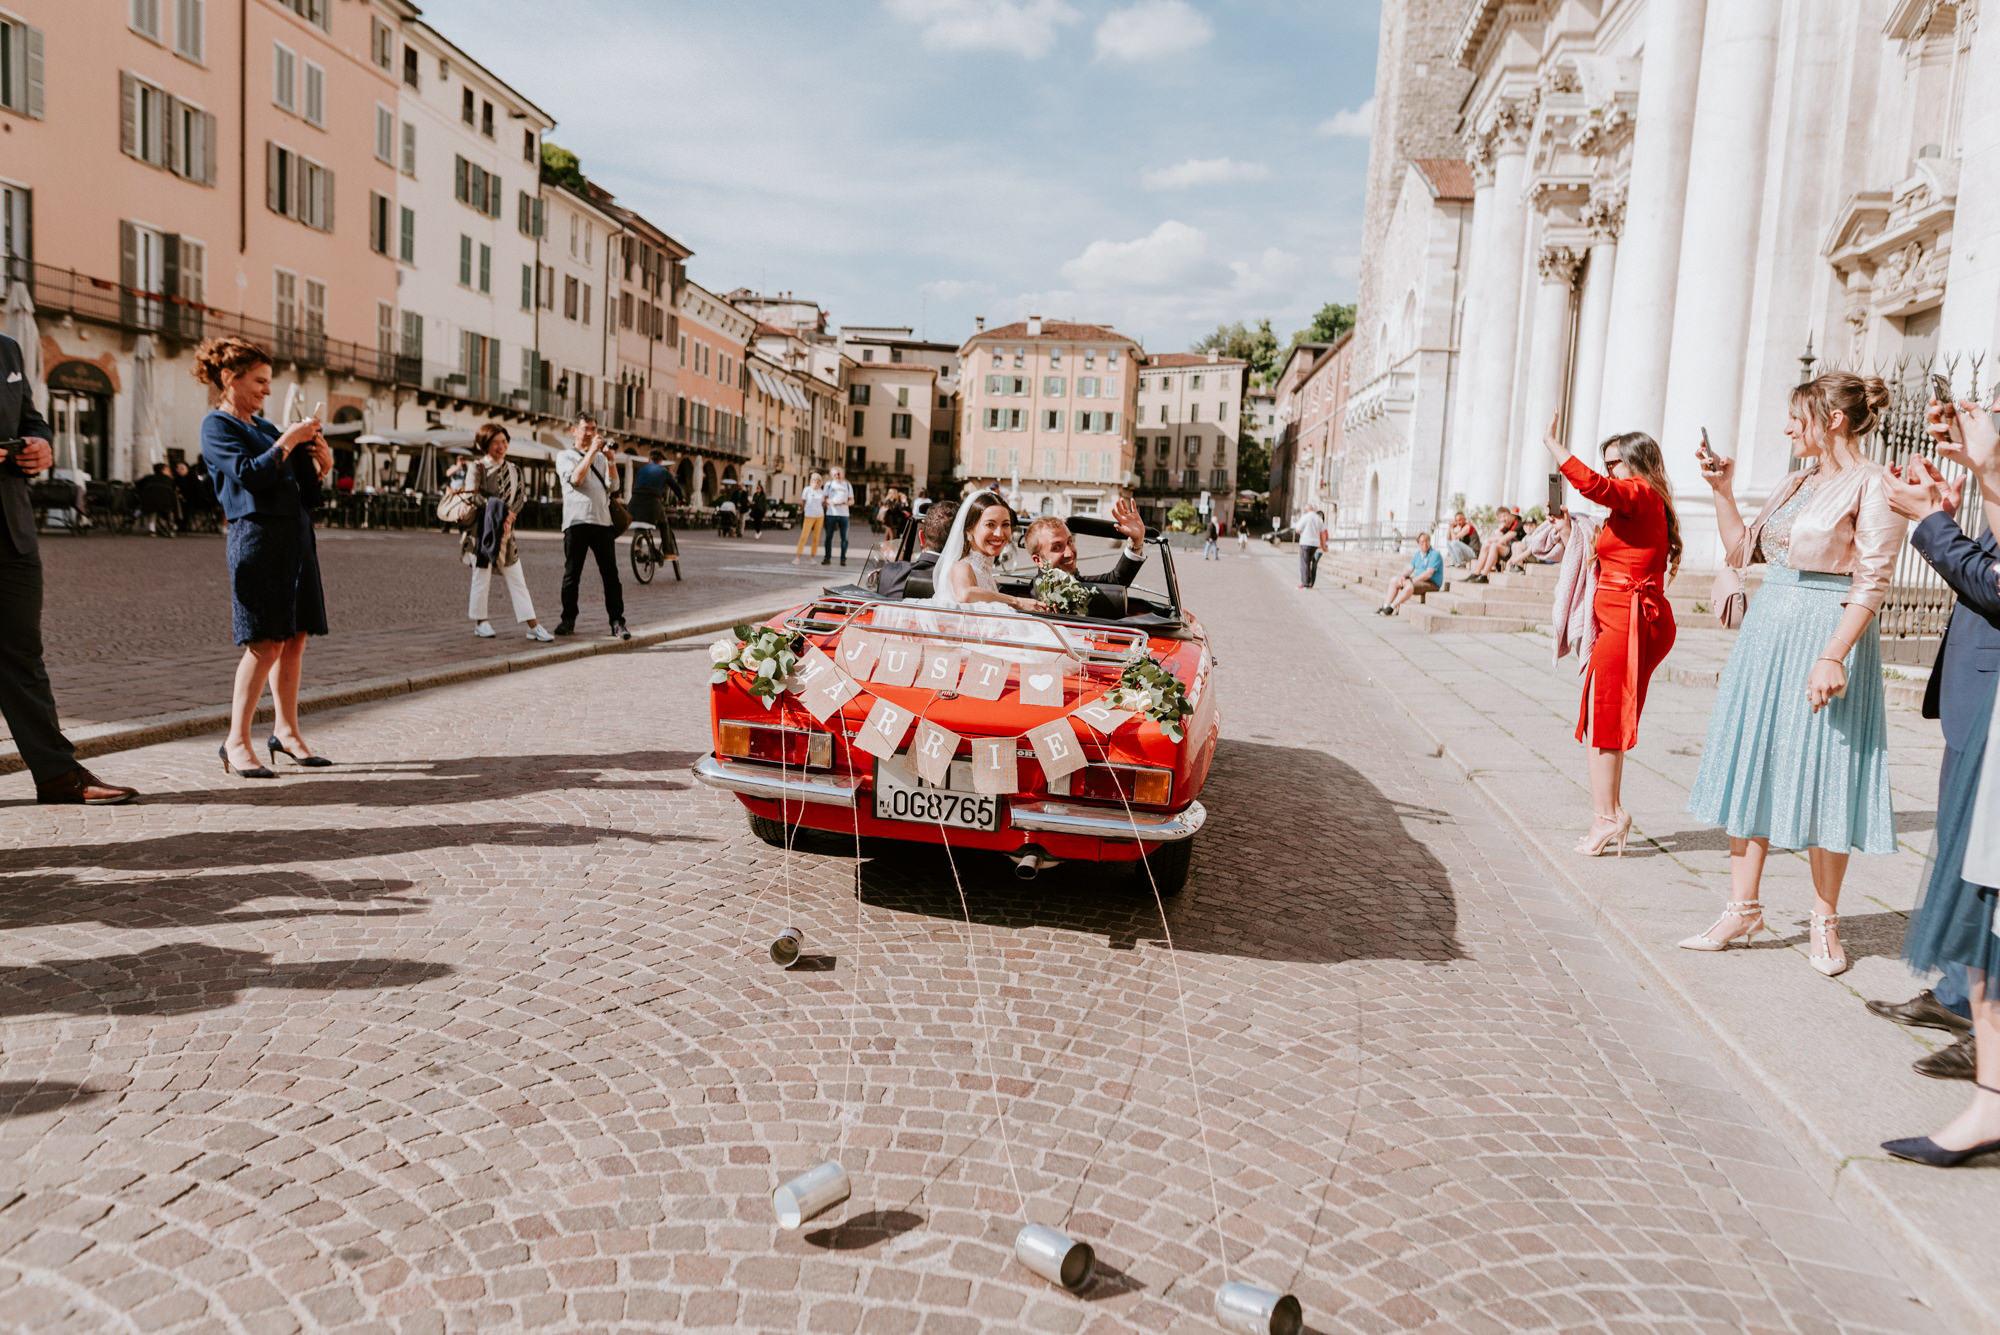 FOTO+PHOTO+BODA+WEDDING+ITALIA+ITALY+MAURICIO+GARAY+MAURICIOGARAY+WEDDINPHOTOGRAPHER+FOTOGRAFODEBODA-1144.jpg